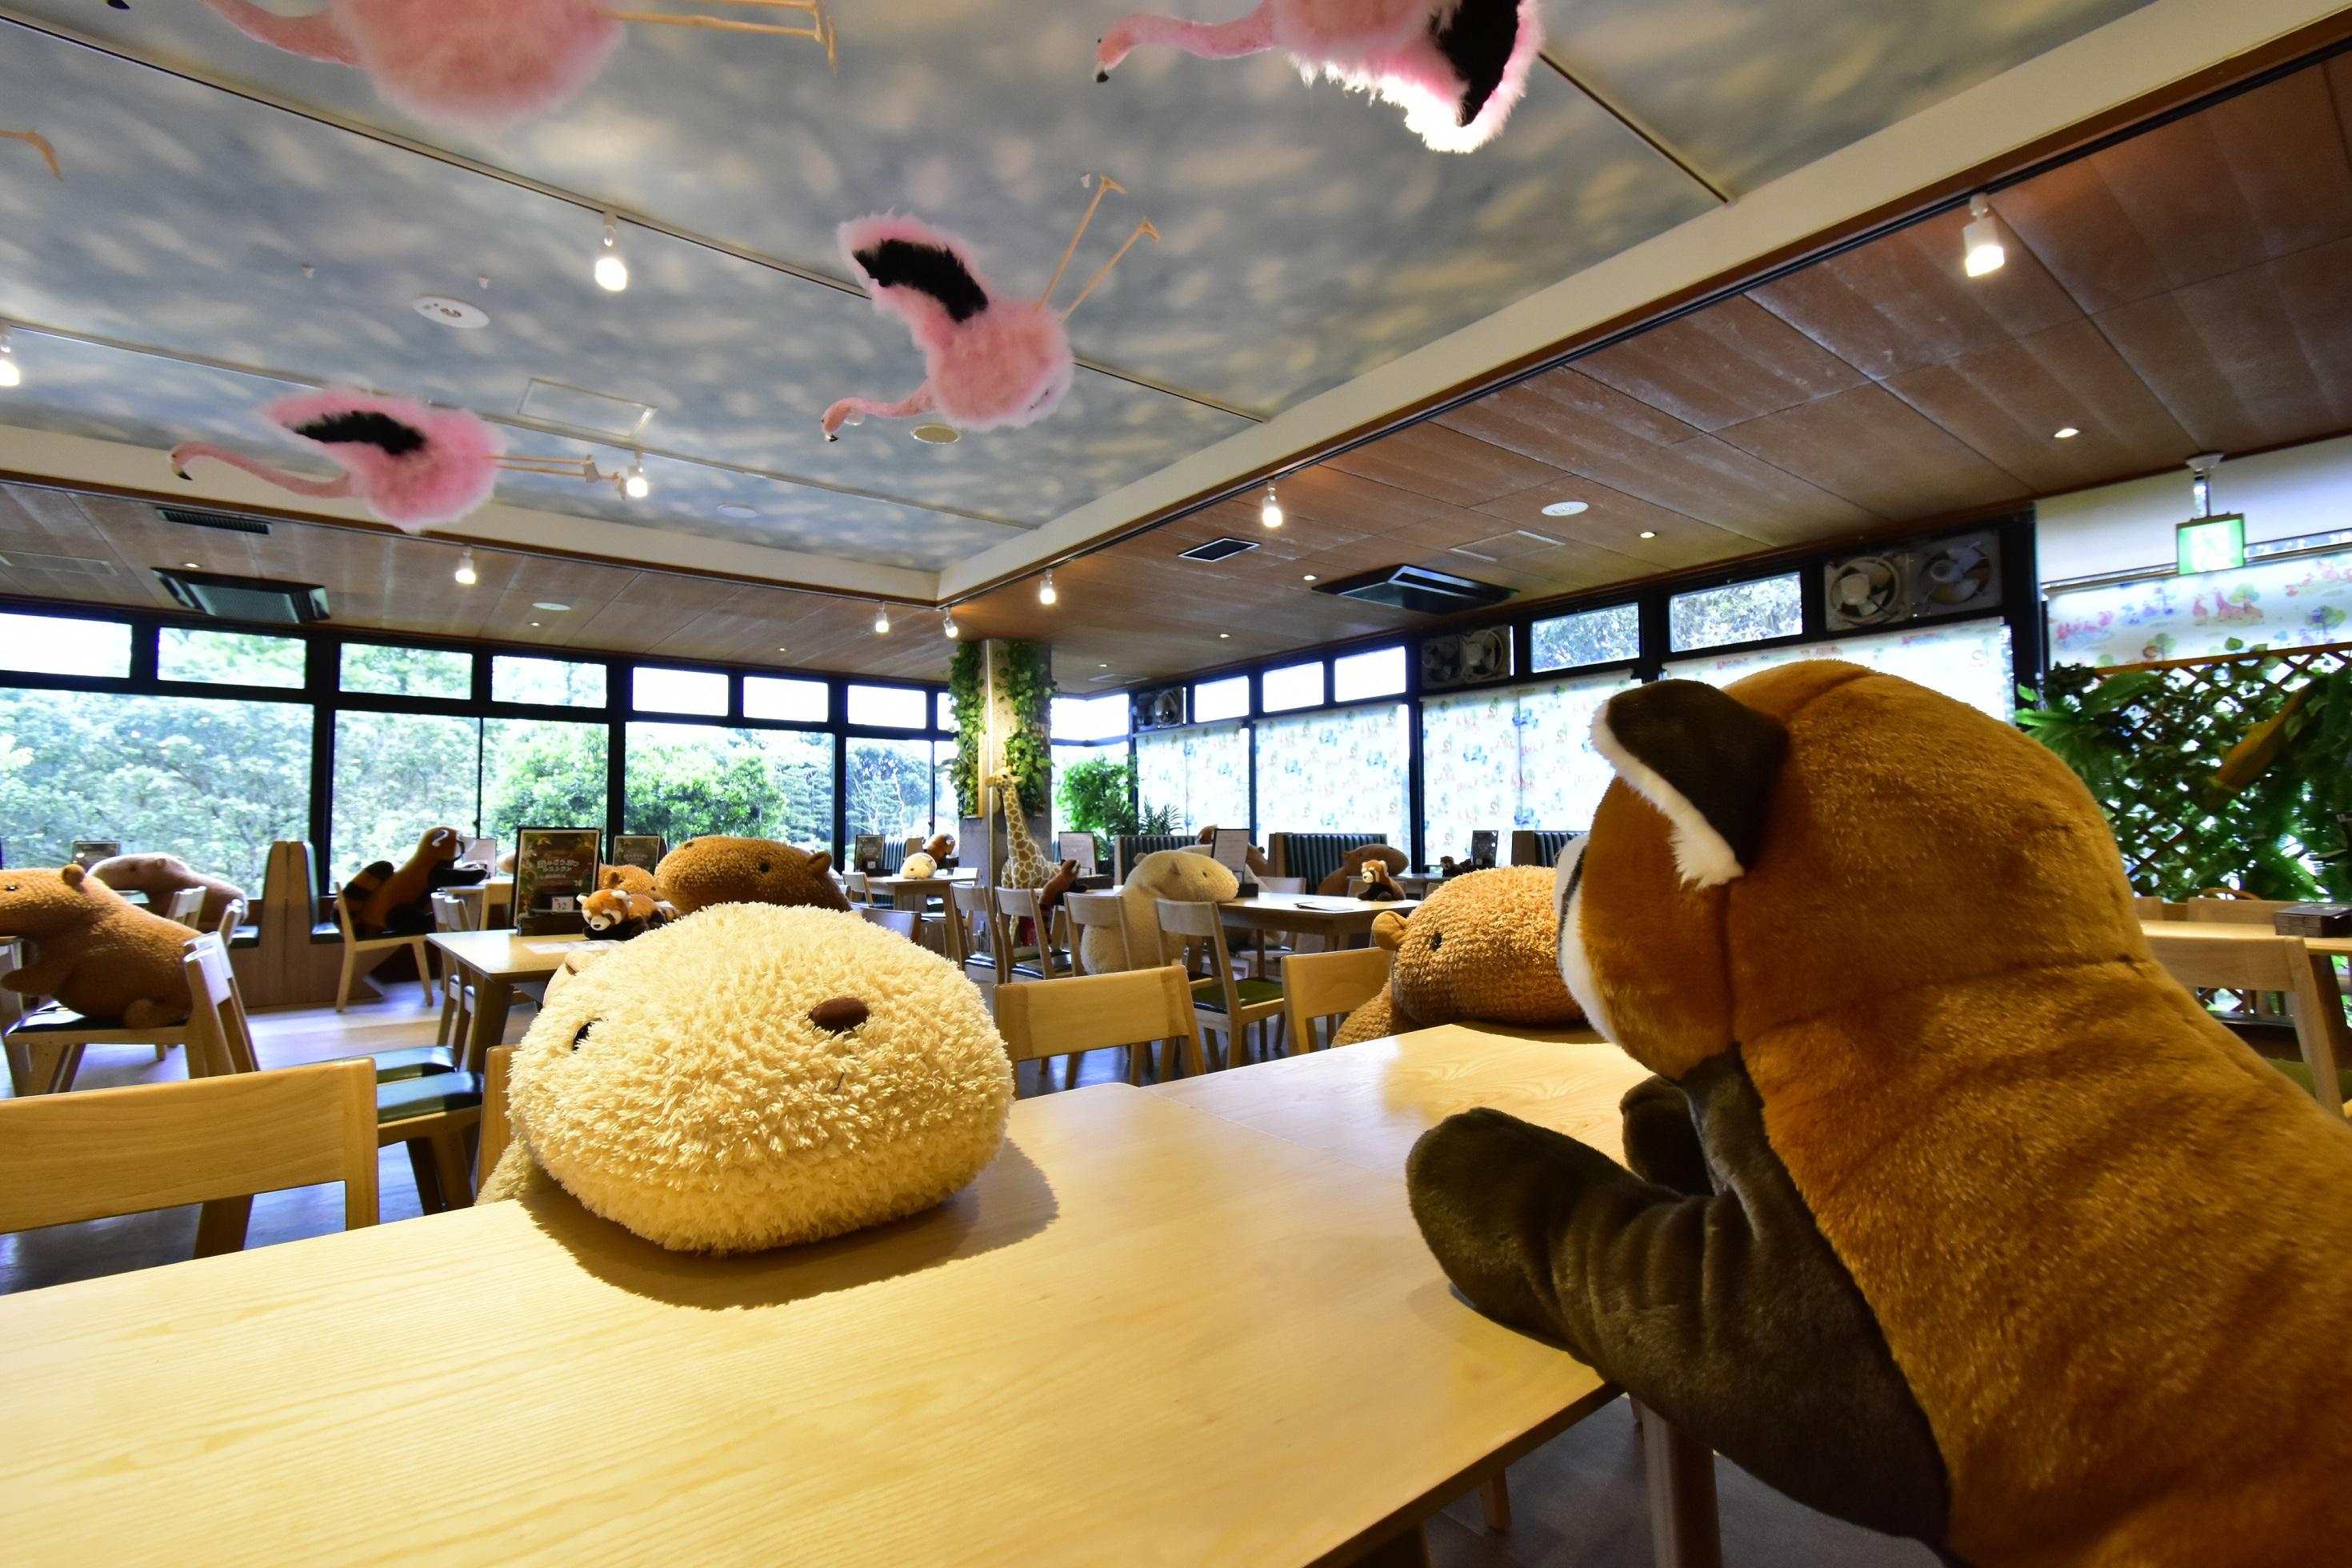 Izu Shaboten Zoo social distancing